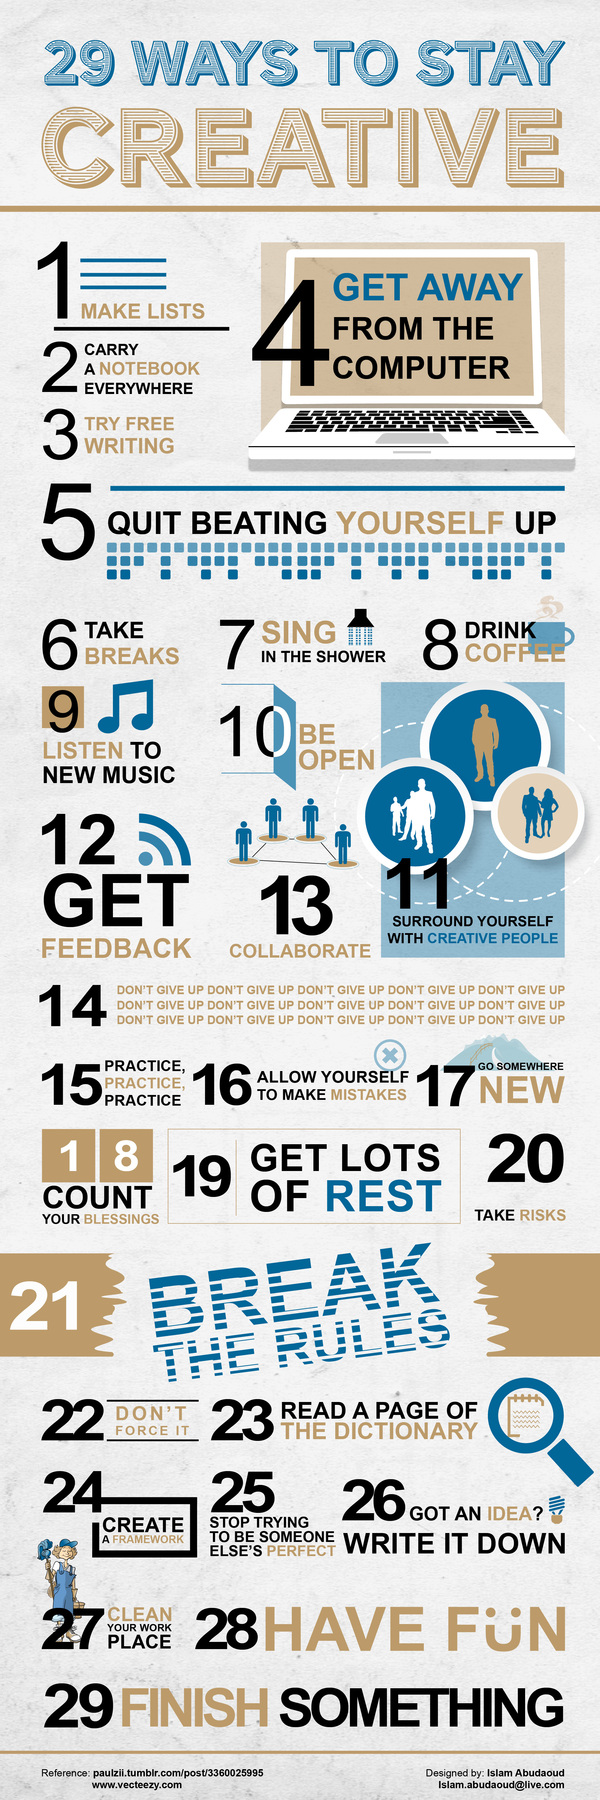 29-ways-creative.jpg